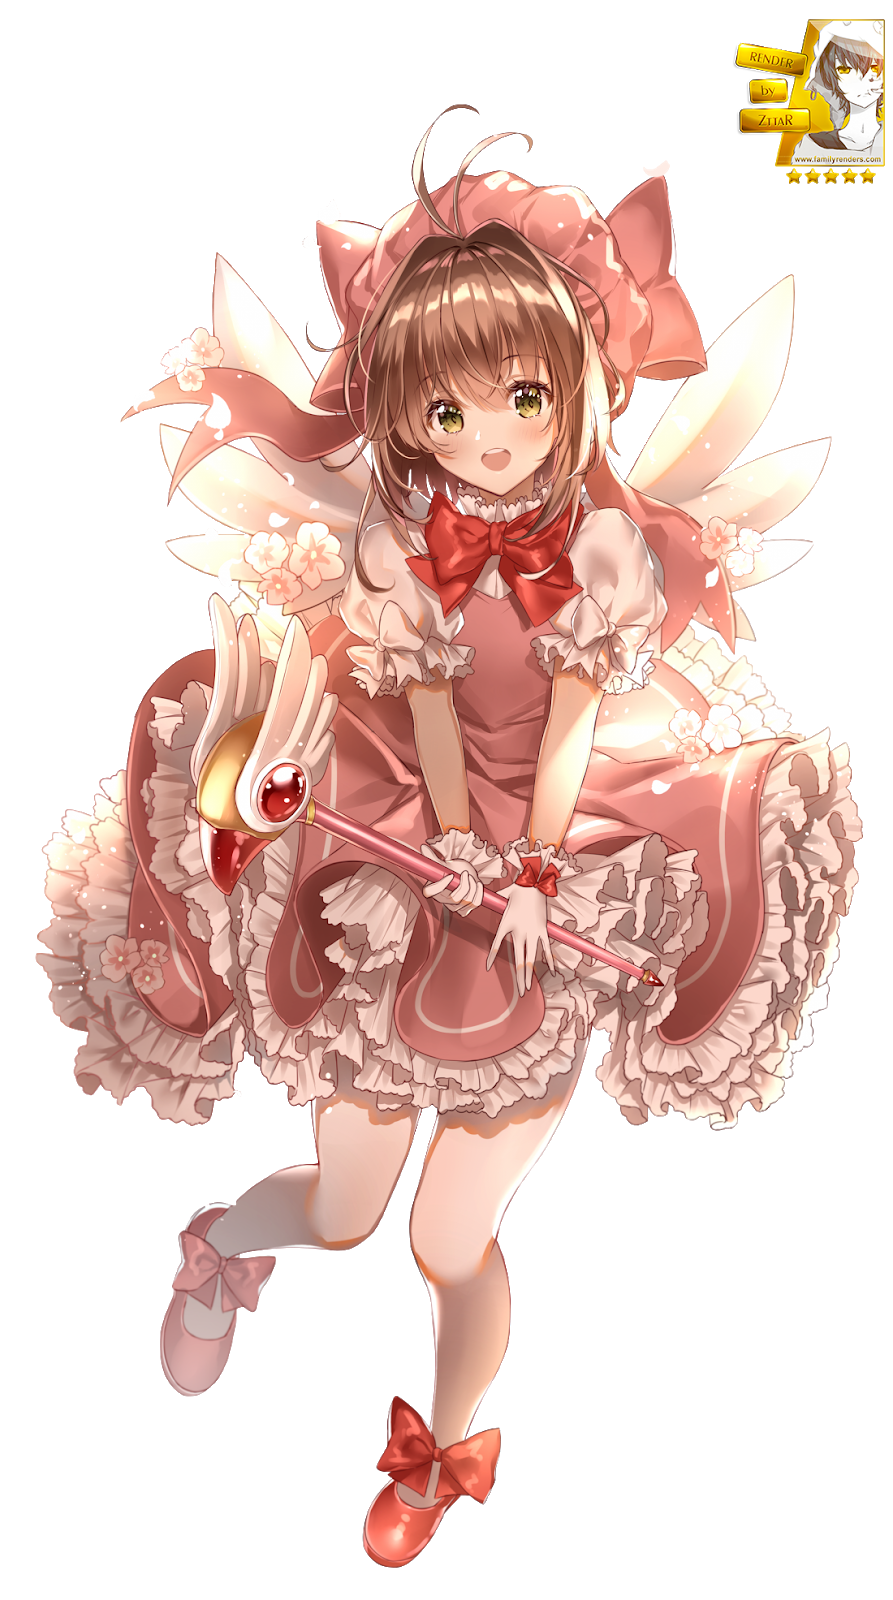 Render Card Captor Sakura #1 v2